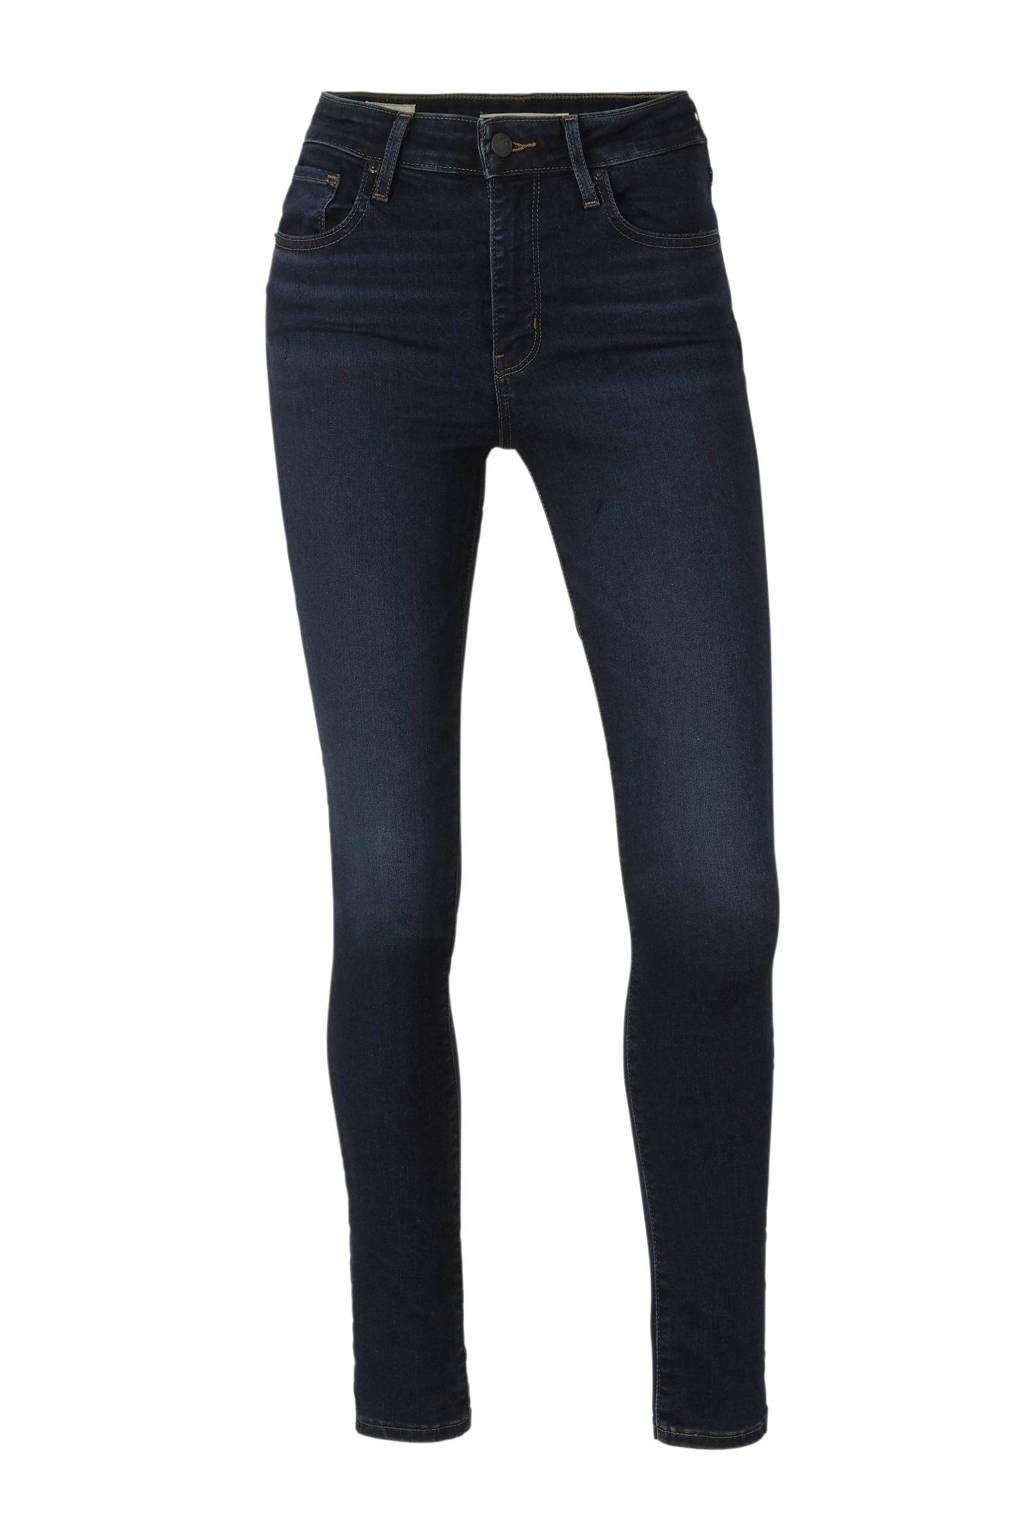 Levi's 721 high waist skinny jeans, Dark denim